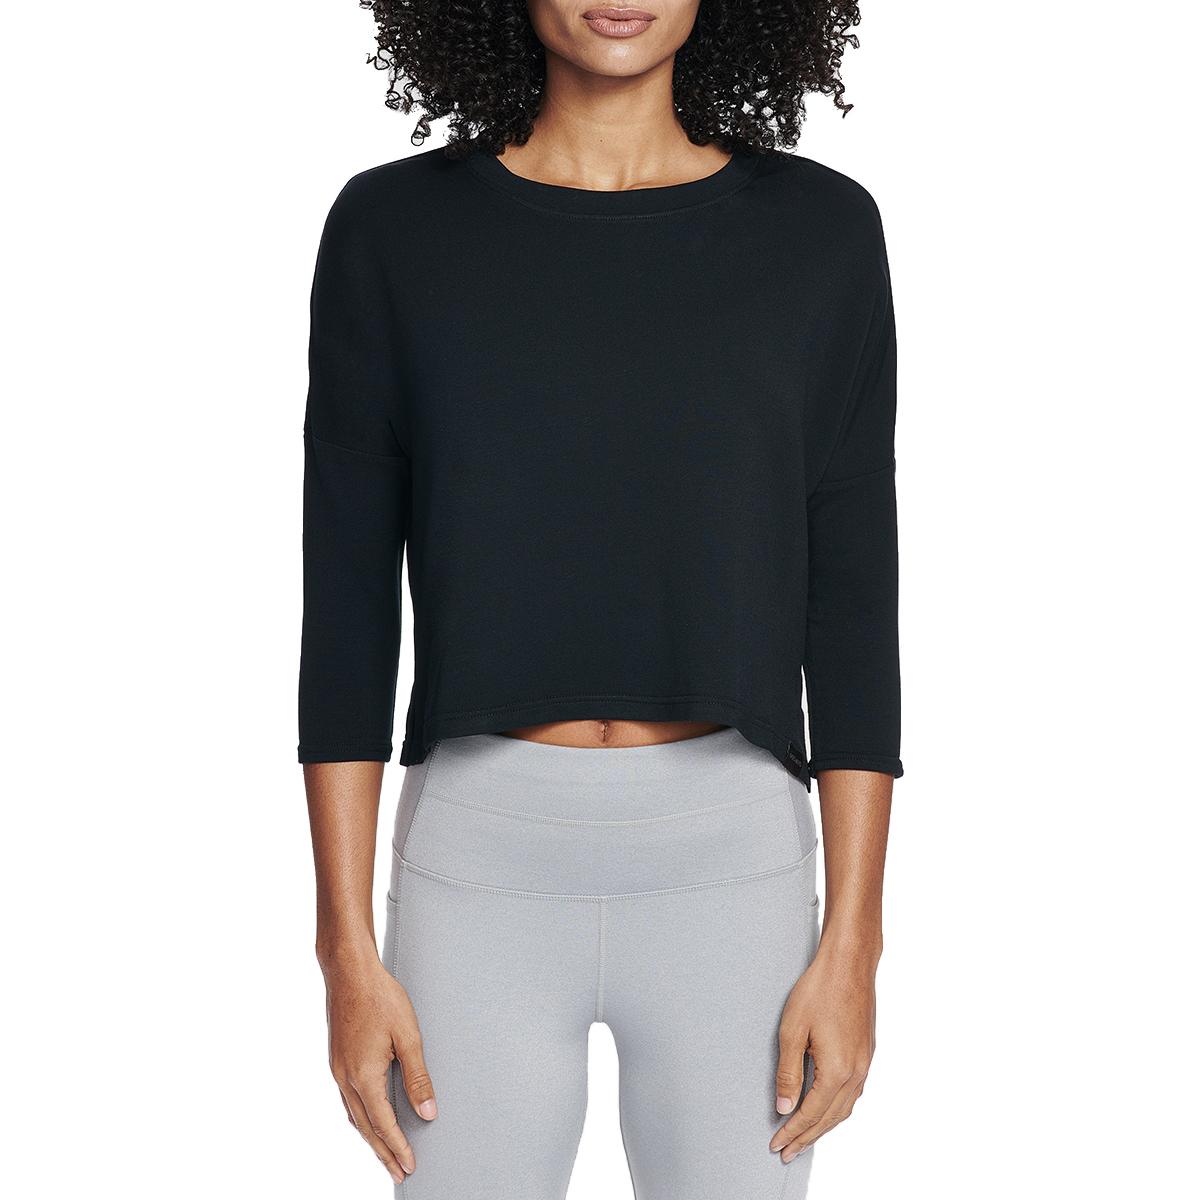 Skechers Women's Day Off A 3/4-Sleeve Top - Black, M